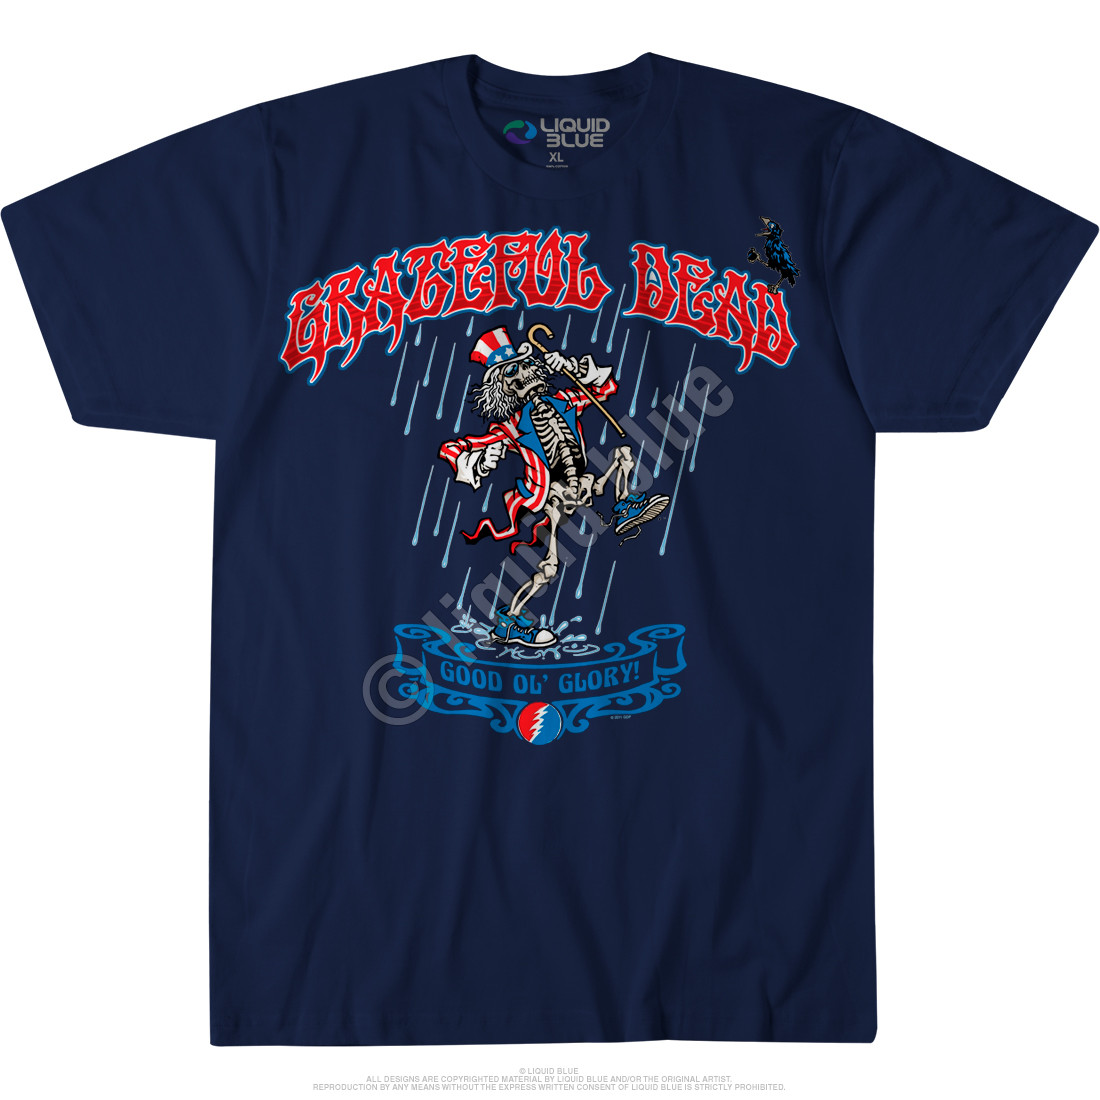 Good 'Ol Glory Custom T-Shirt